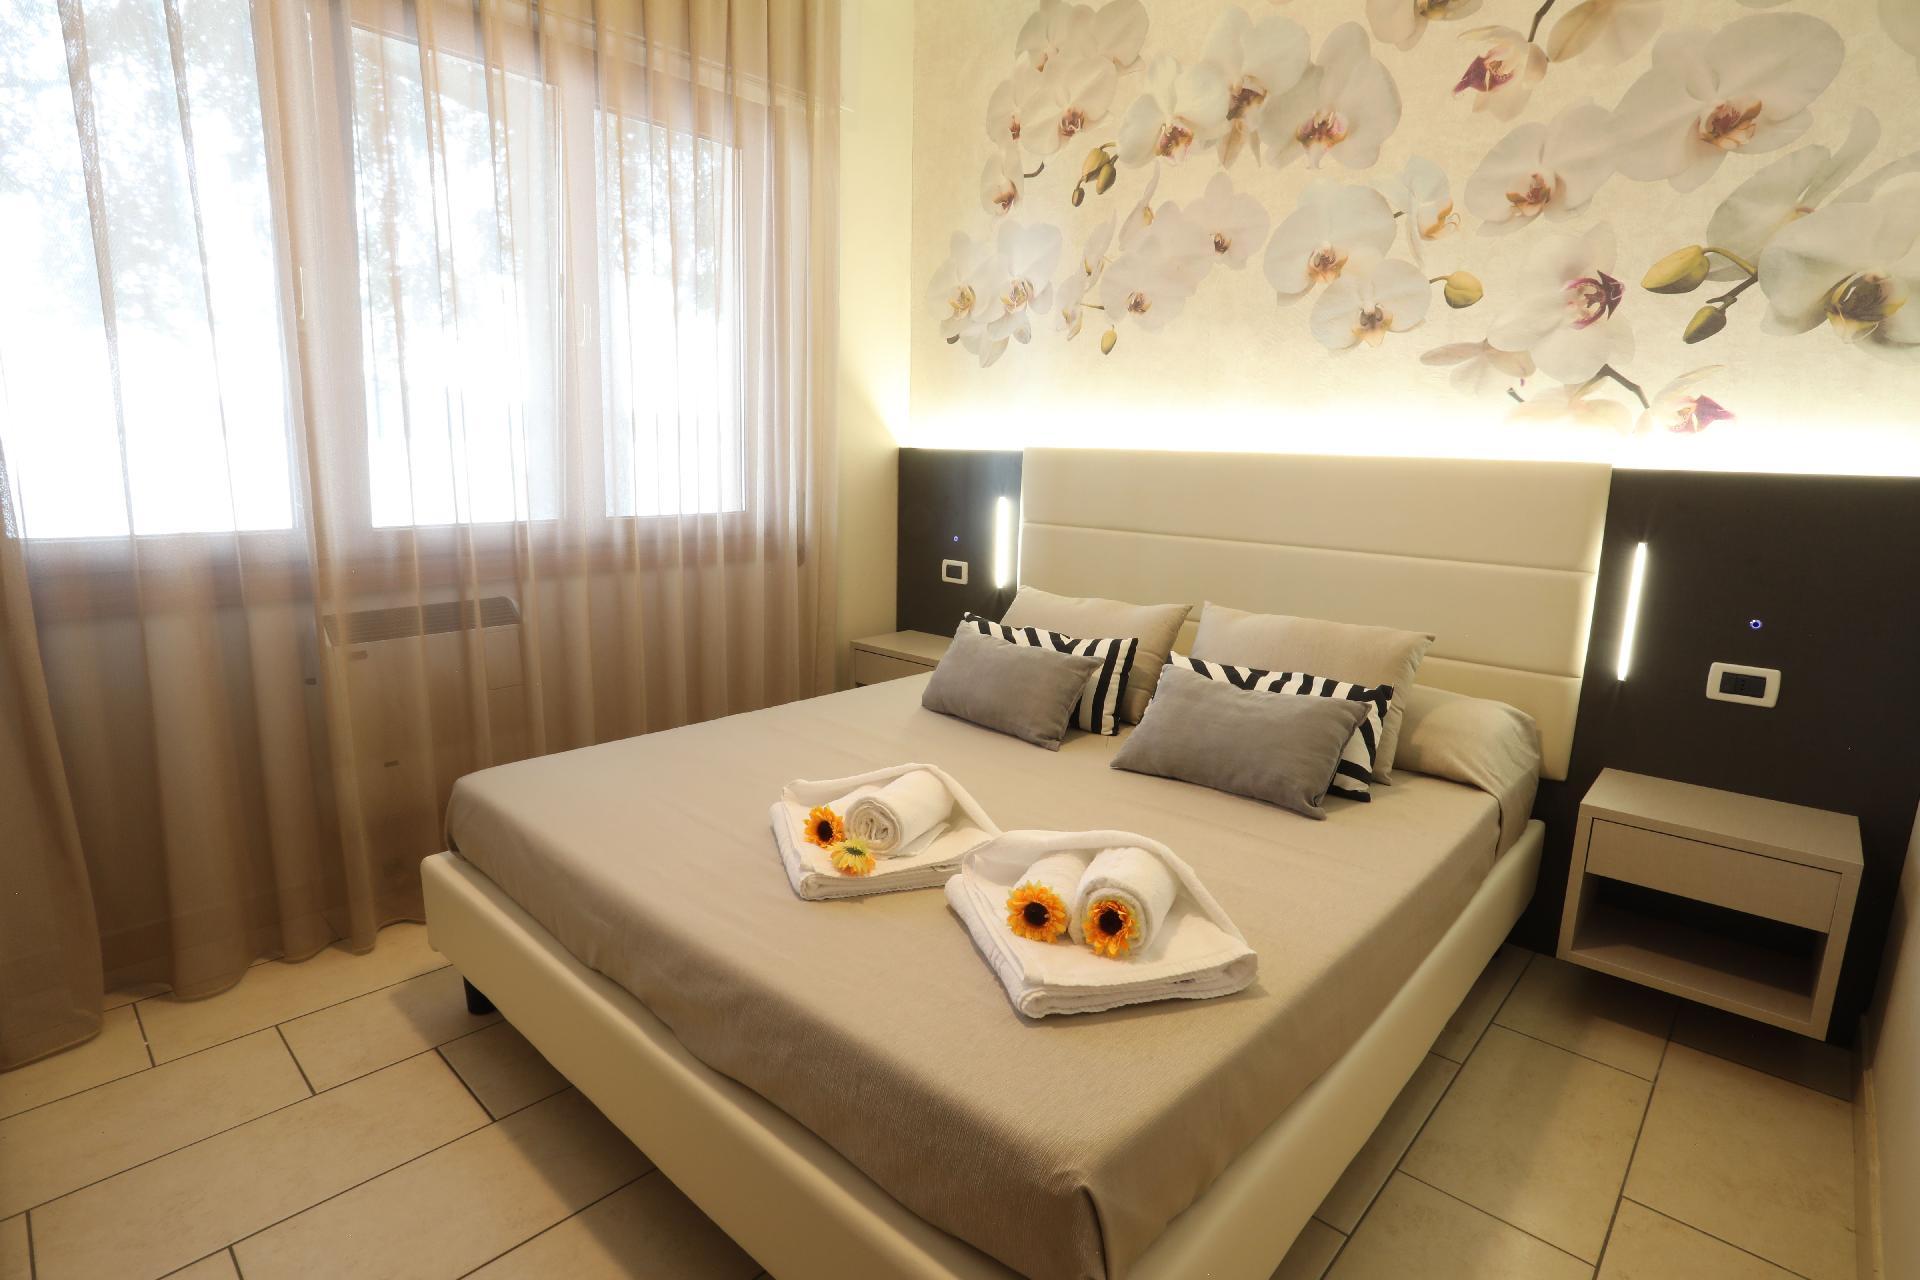 Ferienwohnung für 6 Personen ca. 60 m² i   San Felice del Benaco